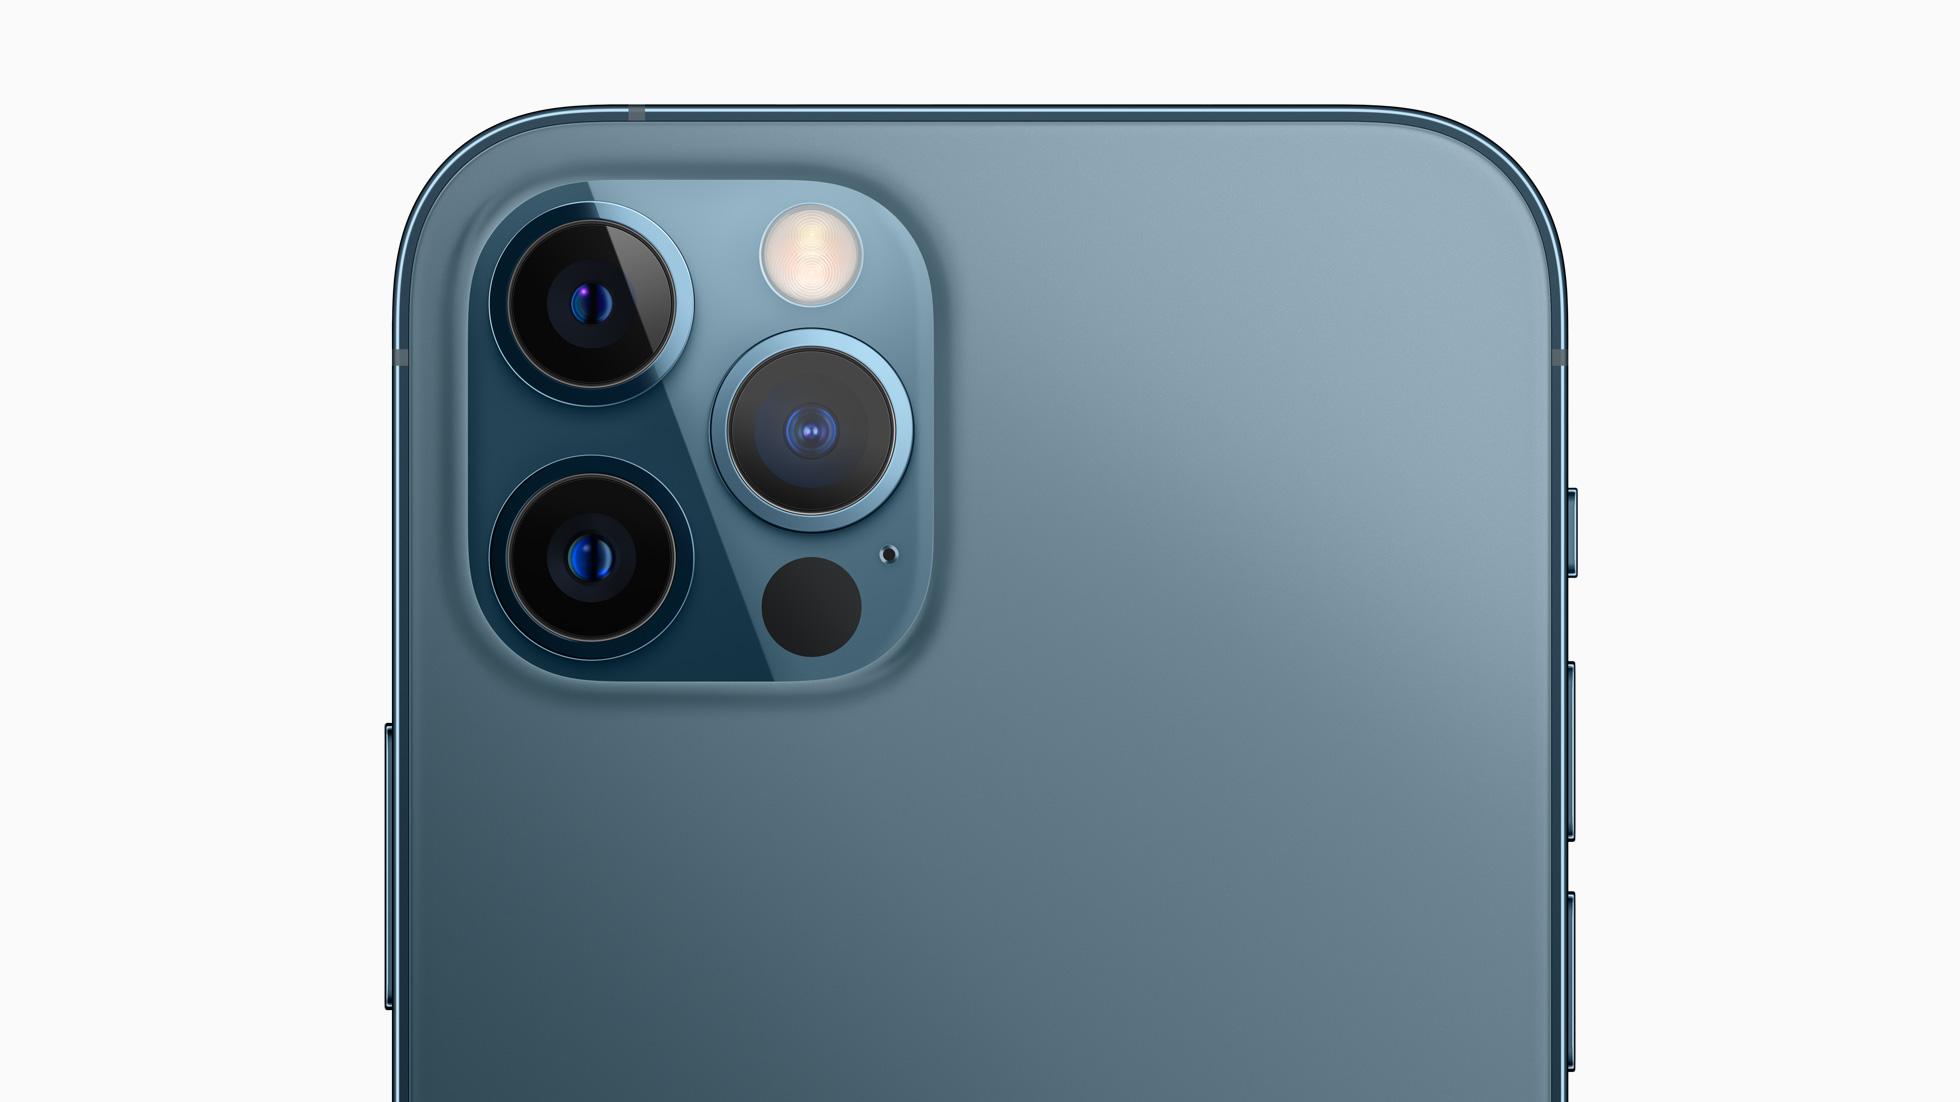 Apple_iphone12pro-back-camera_10132020_big.jpg.large_2x.jpg